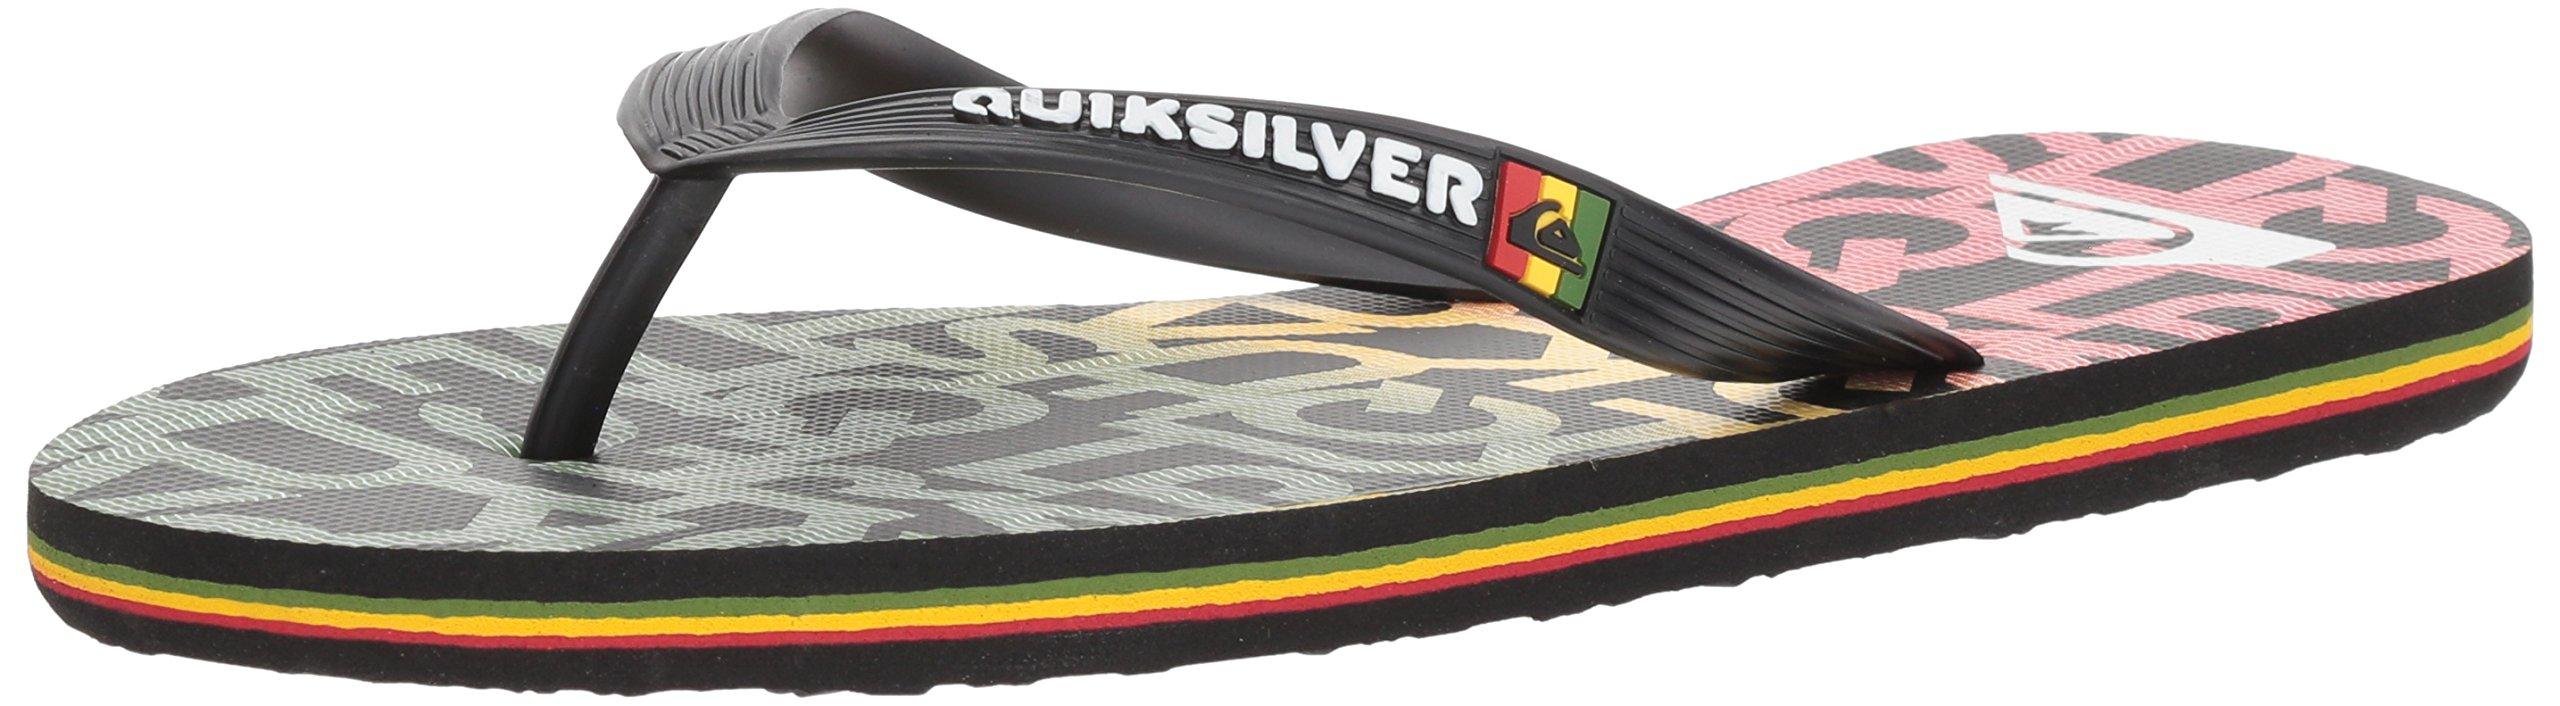 Quiksilver Men's Molokai Random Sandal, Black/Red/Green, 12 M US